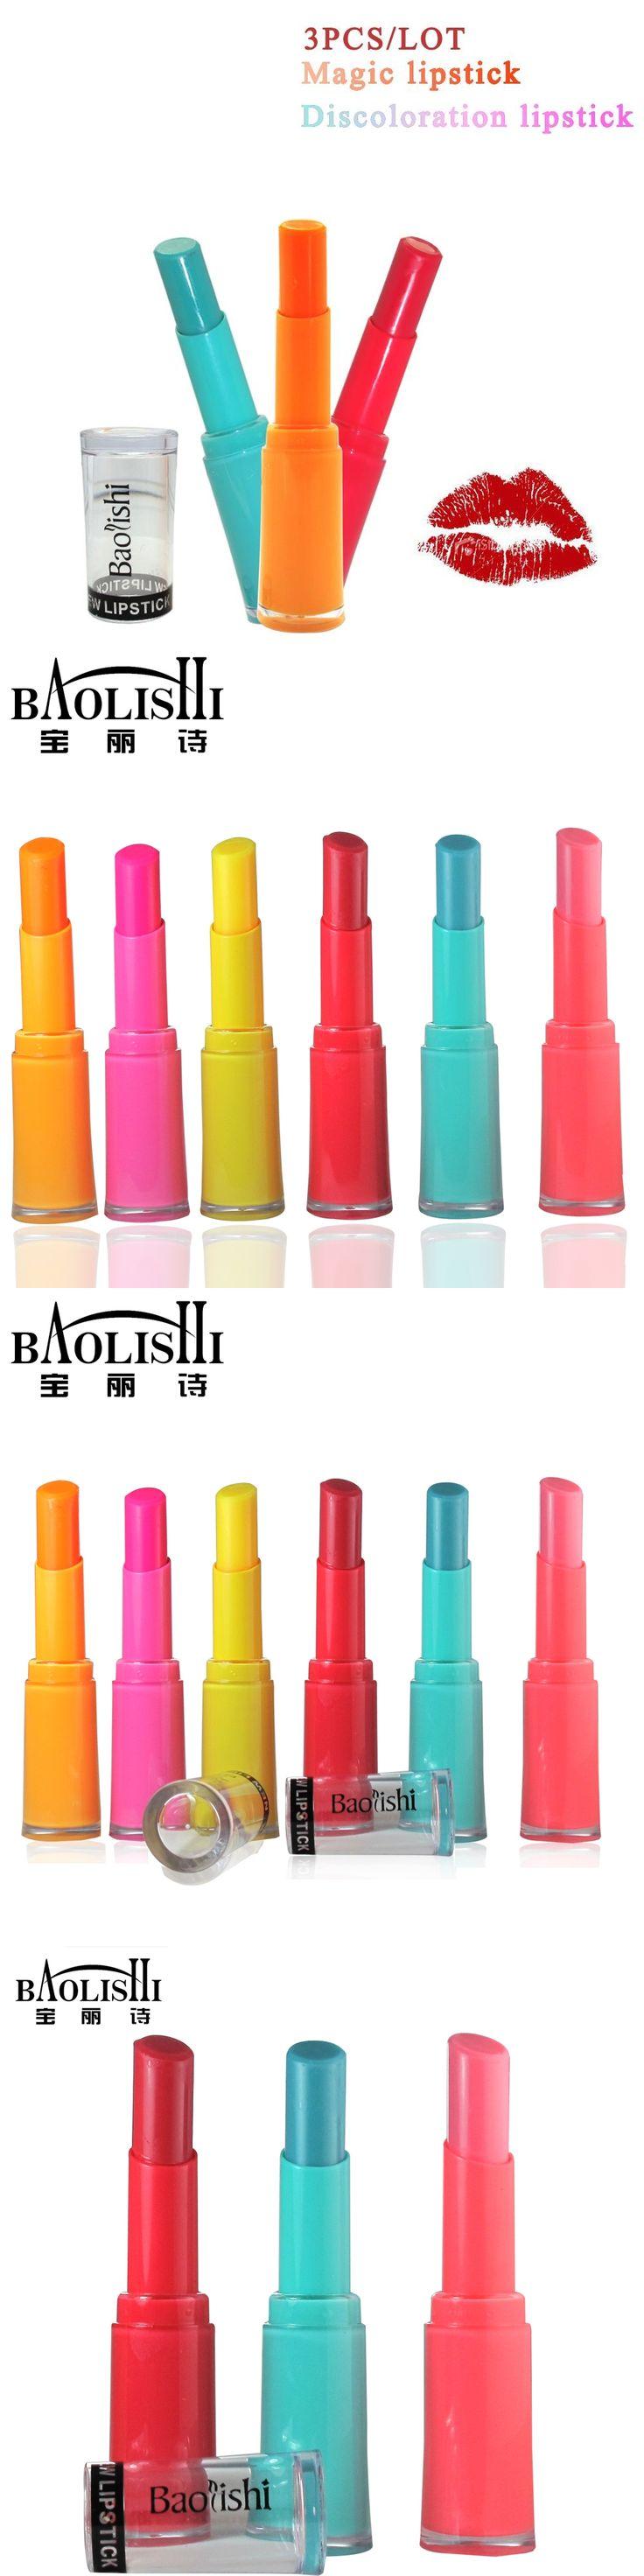 baolishi magic lipstick change colour natural lip balm matte lipstick red tint lip gloss beauty brand makeup